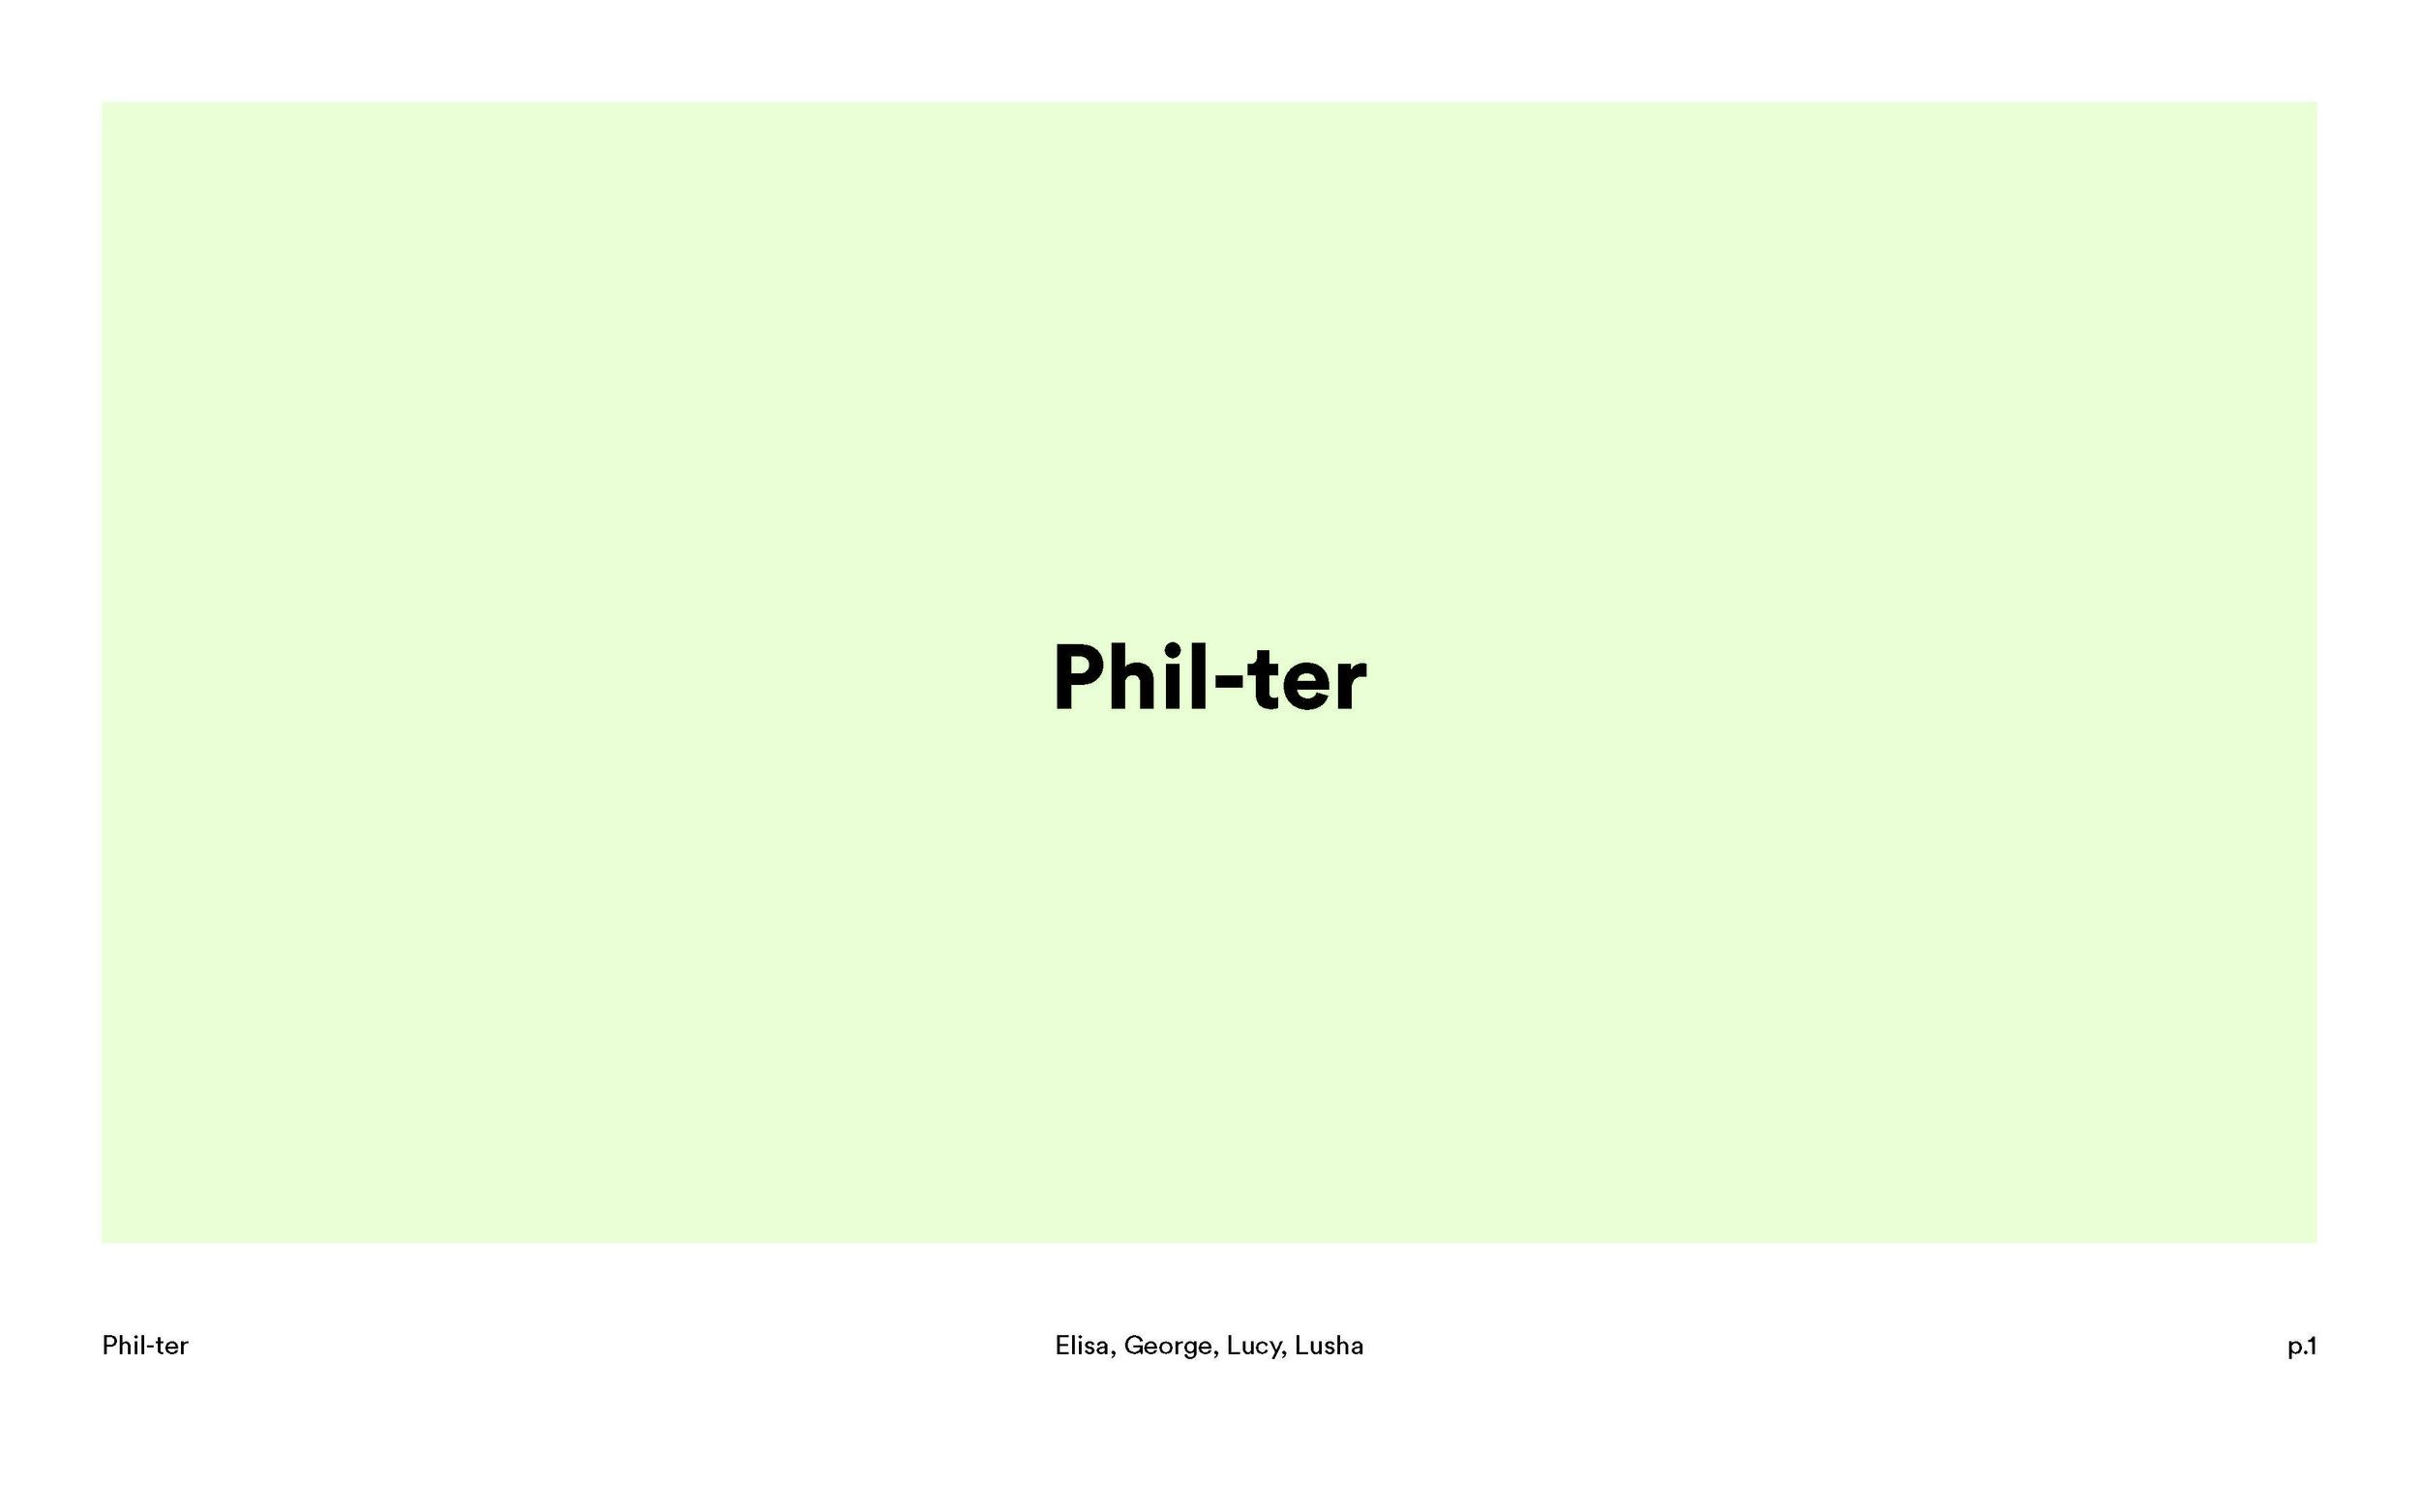 Phil-terFinalPresentation_页面_01.jpg